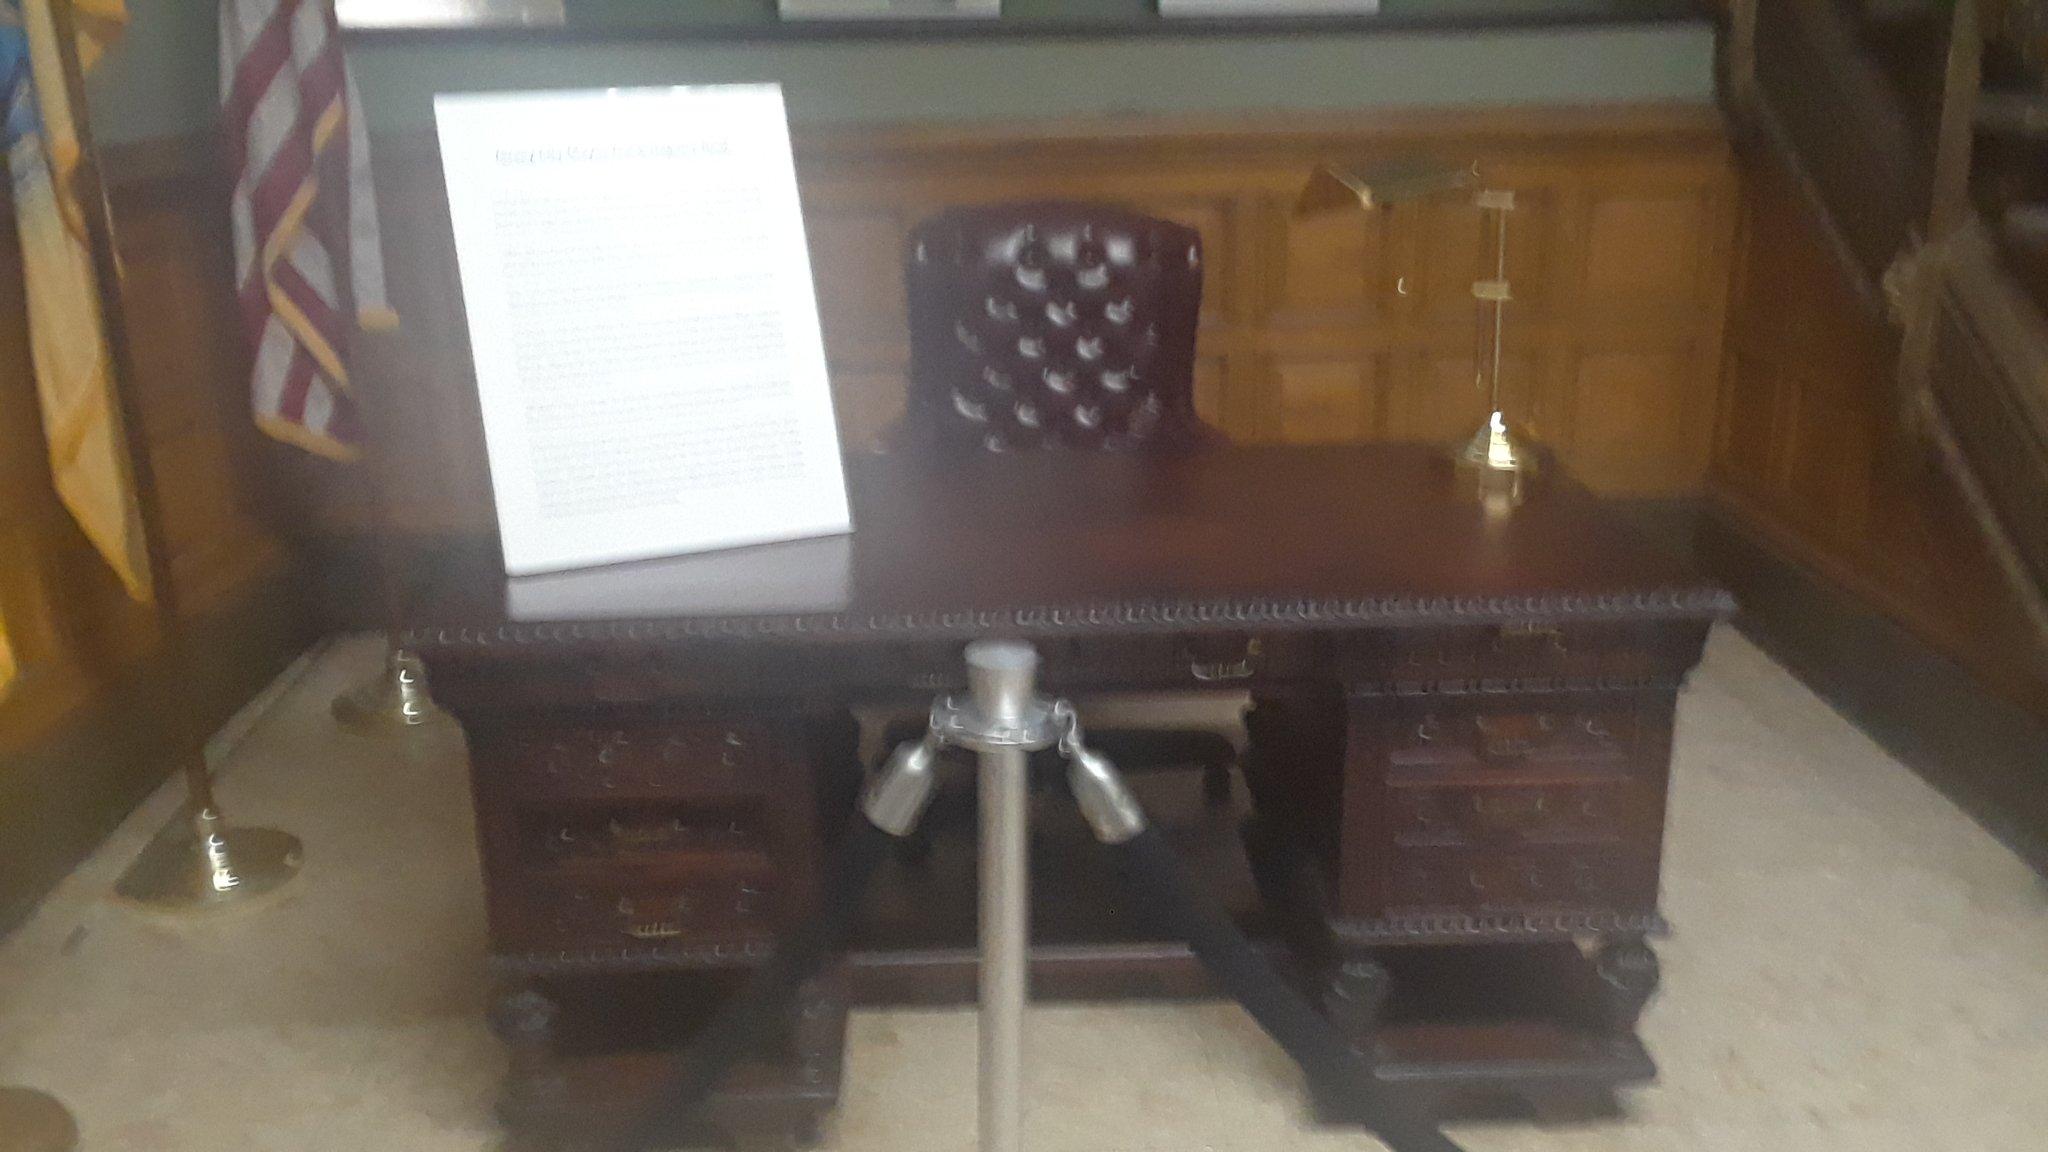 Mayor Frank Hague's desk